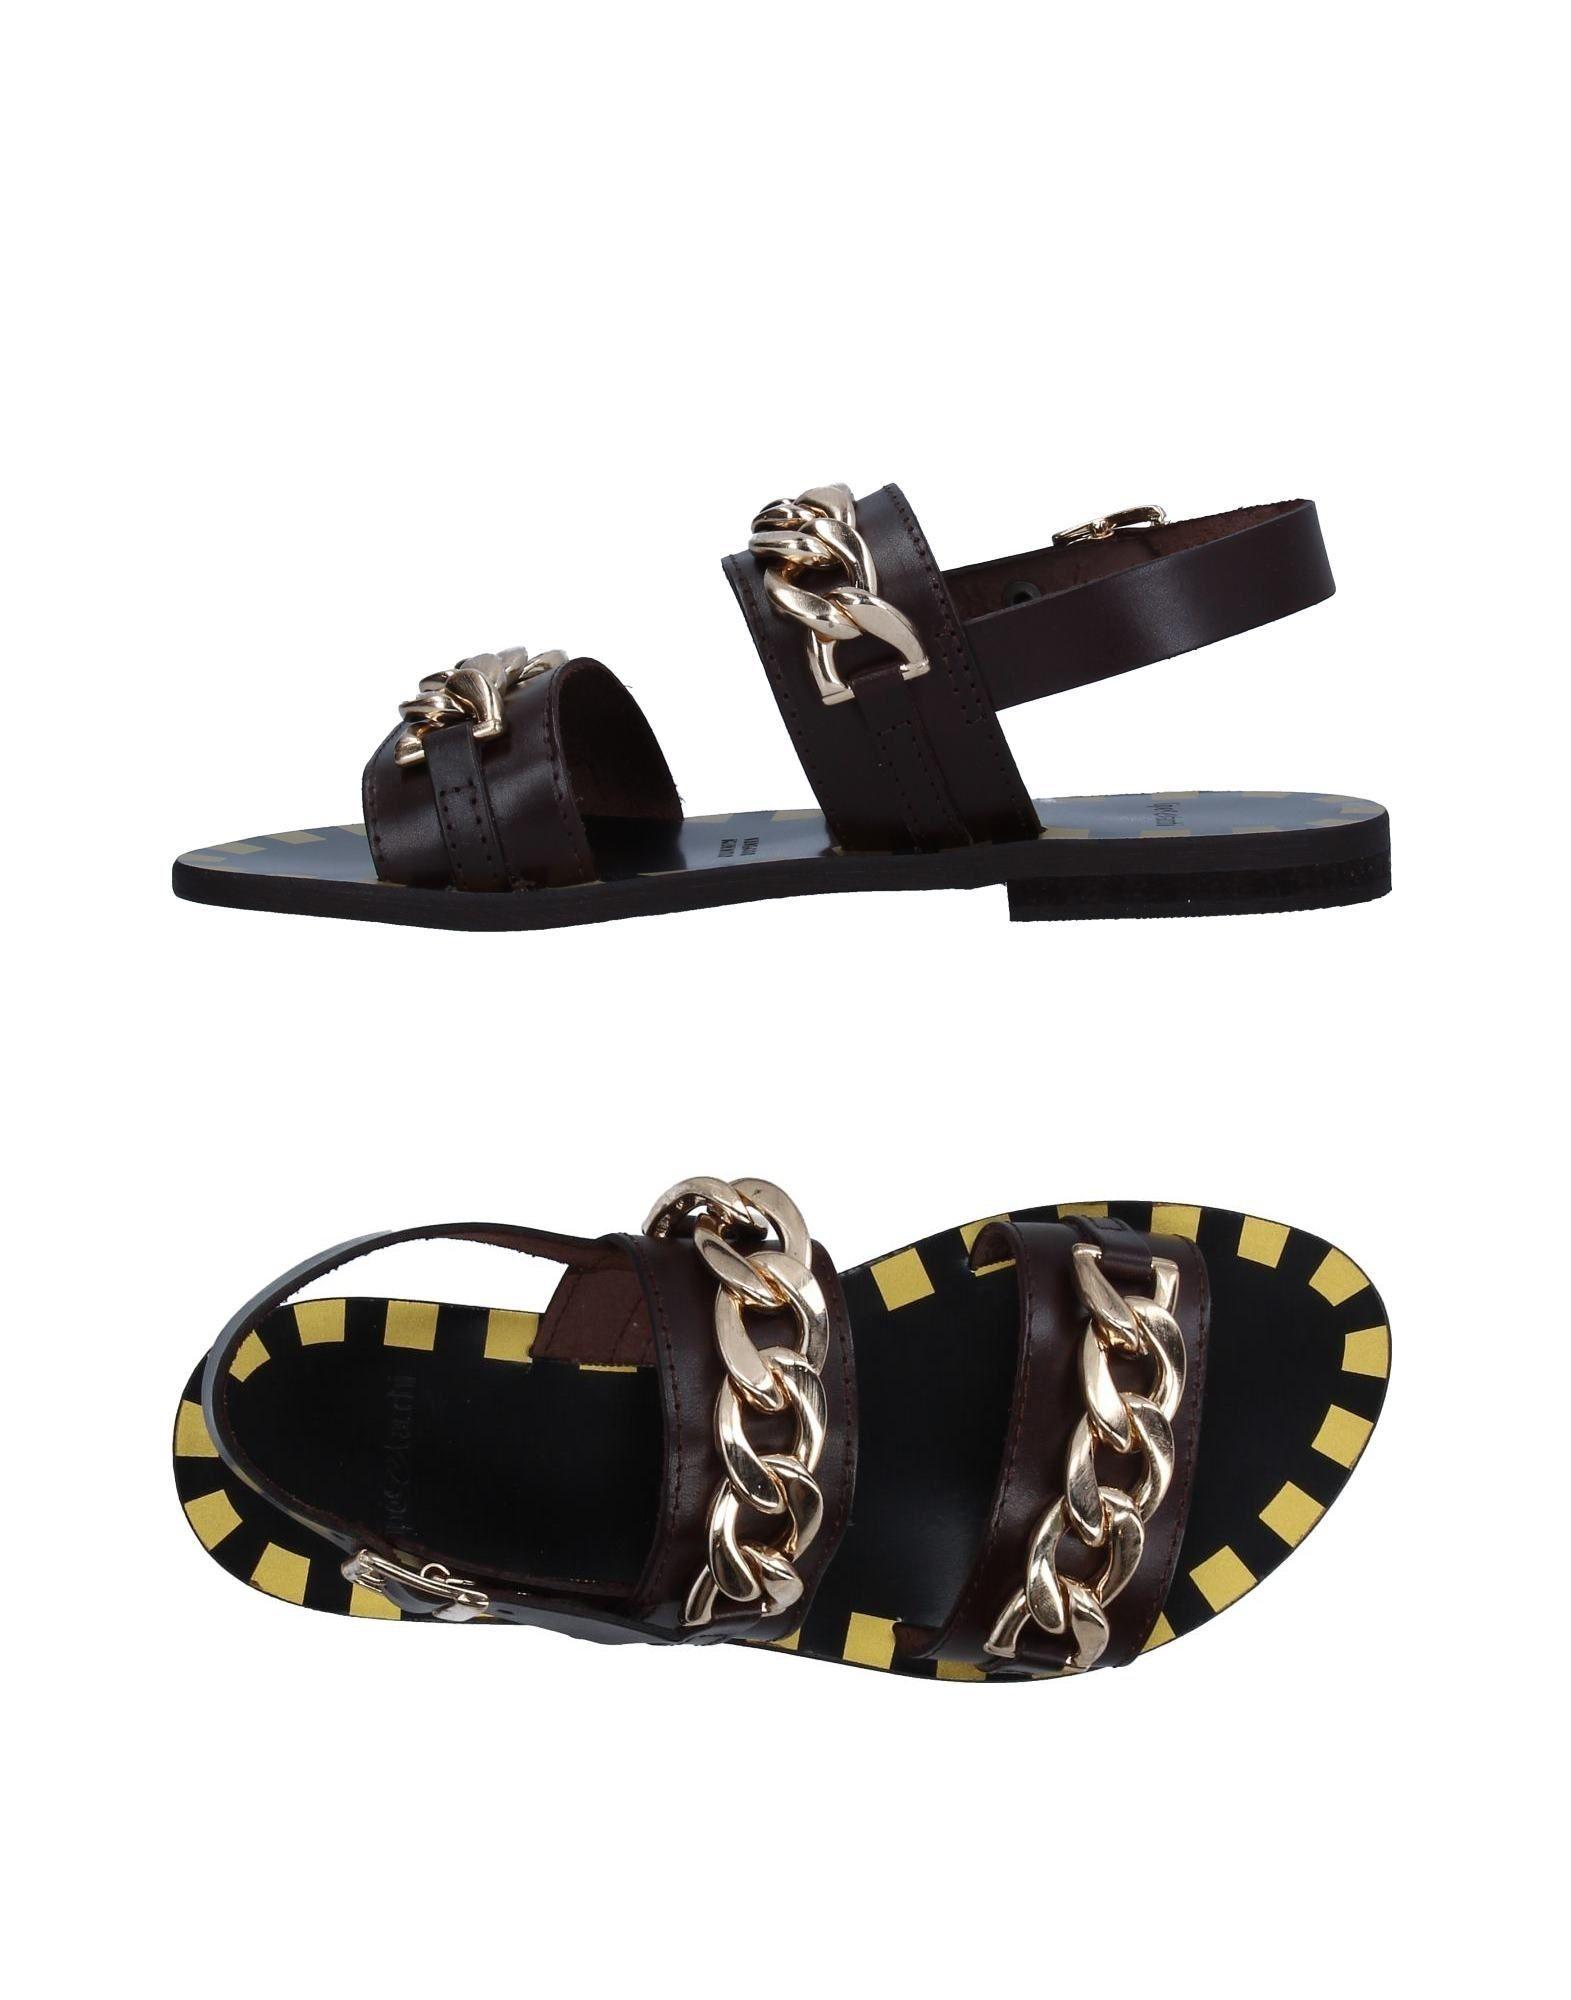 Tipe E Tacchi Sandalen Damen  11332503LO Gute Qualität beliebte Schuhe